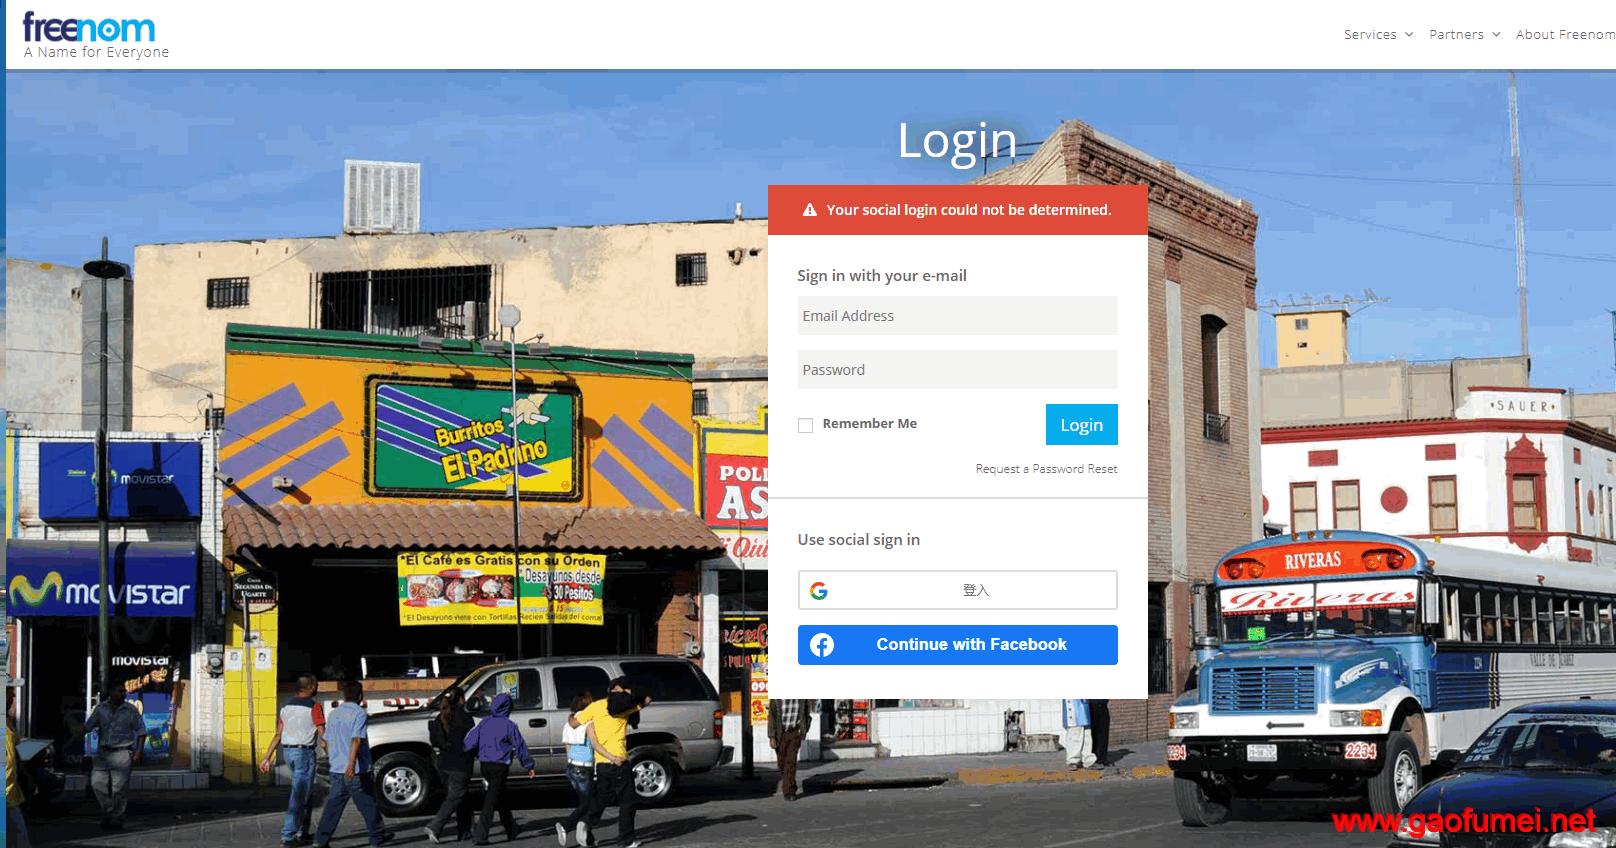 freenom用谷歌帐号来登陆,直接提示:Your social login could not be deturemined无法确定您的社交登录名.)的终级解决办法,亲测有效。 网络问题 第1张-泥人传说